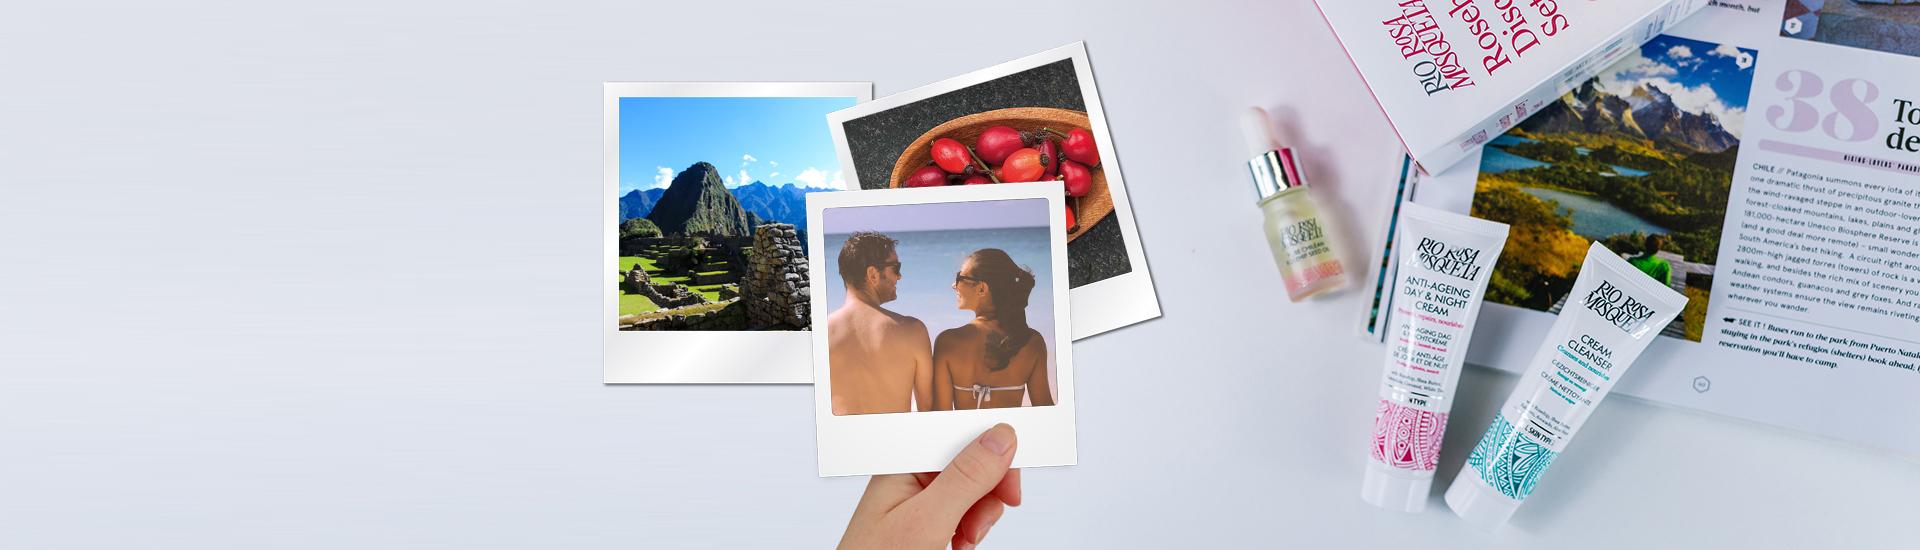 Discoveryset vakantie - RioRosa